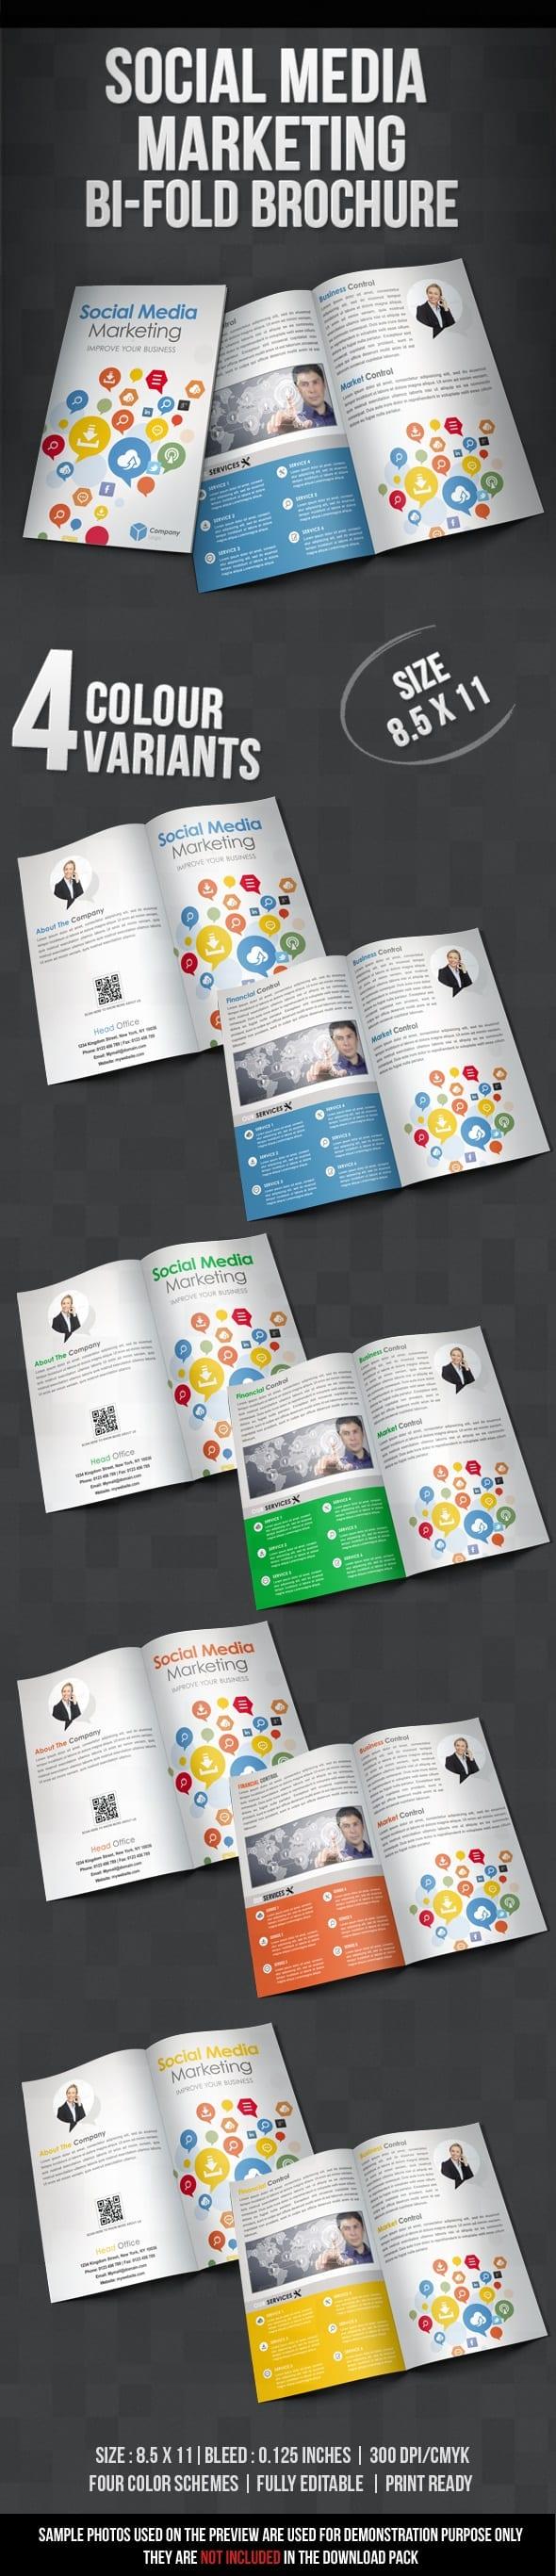 Social-Media-Marketing-Bi-foldmock